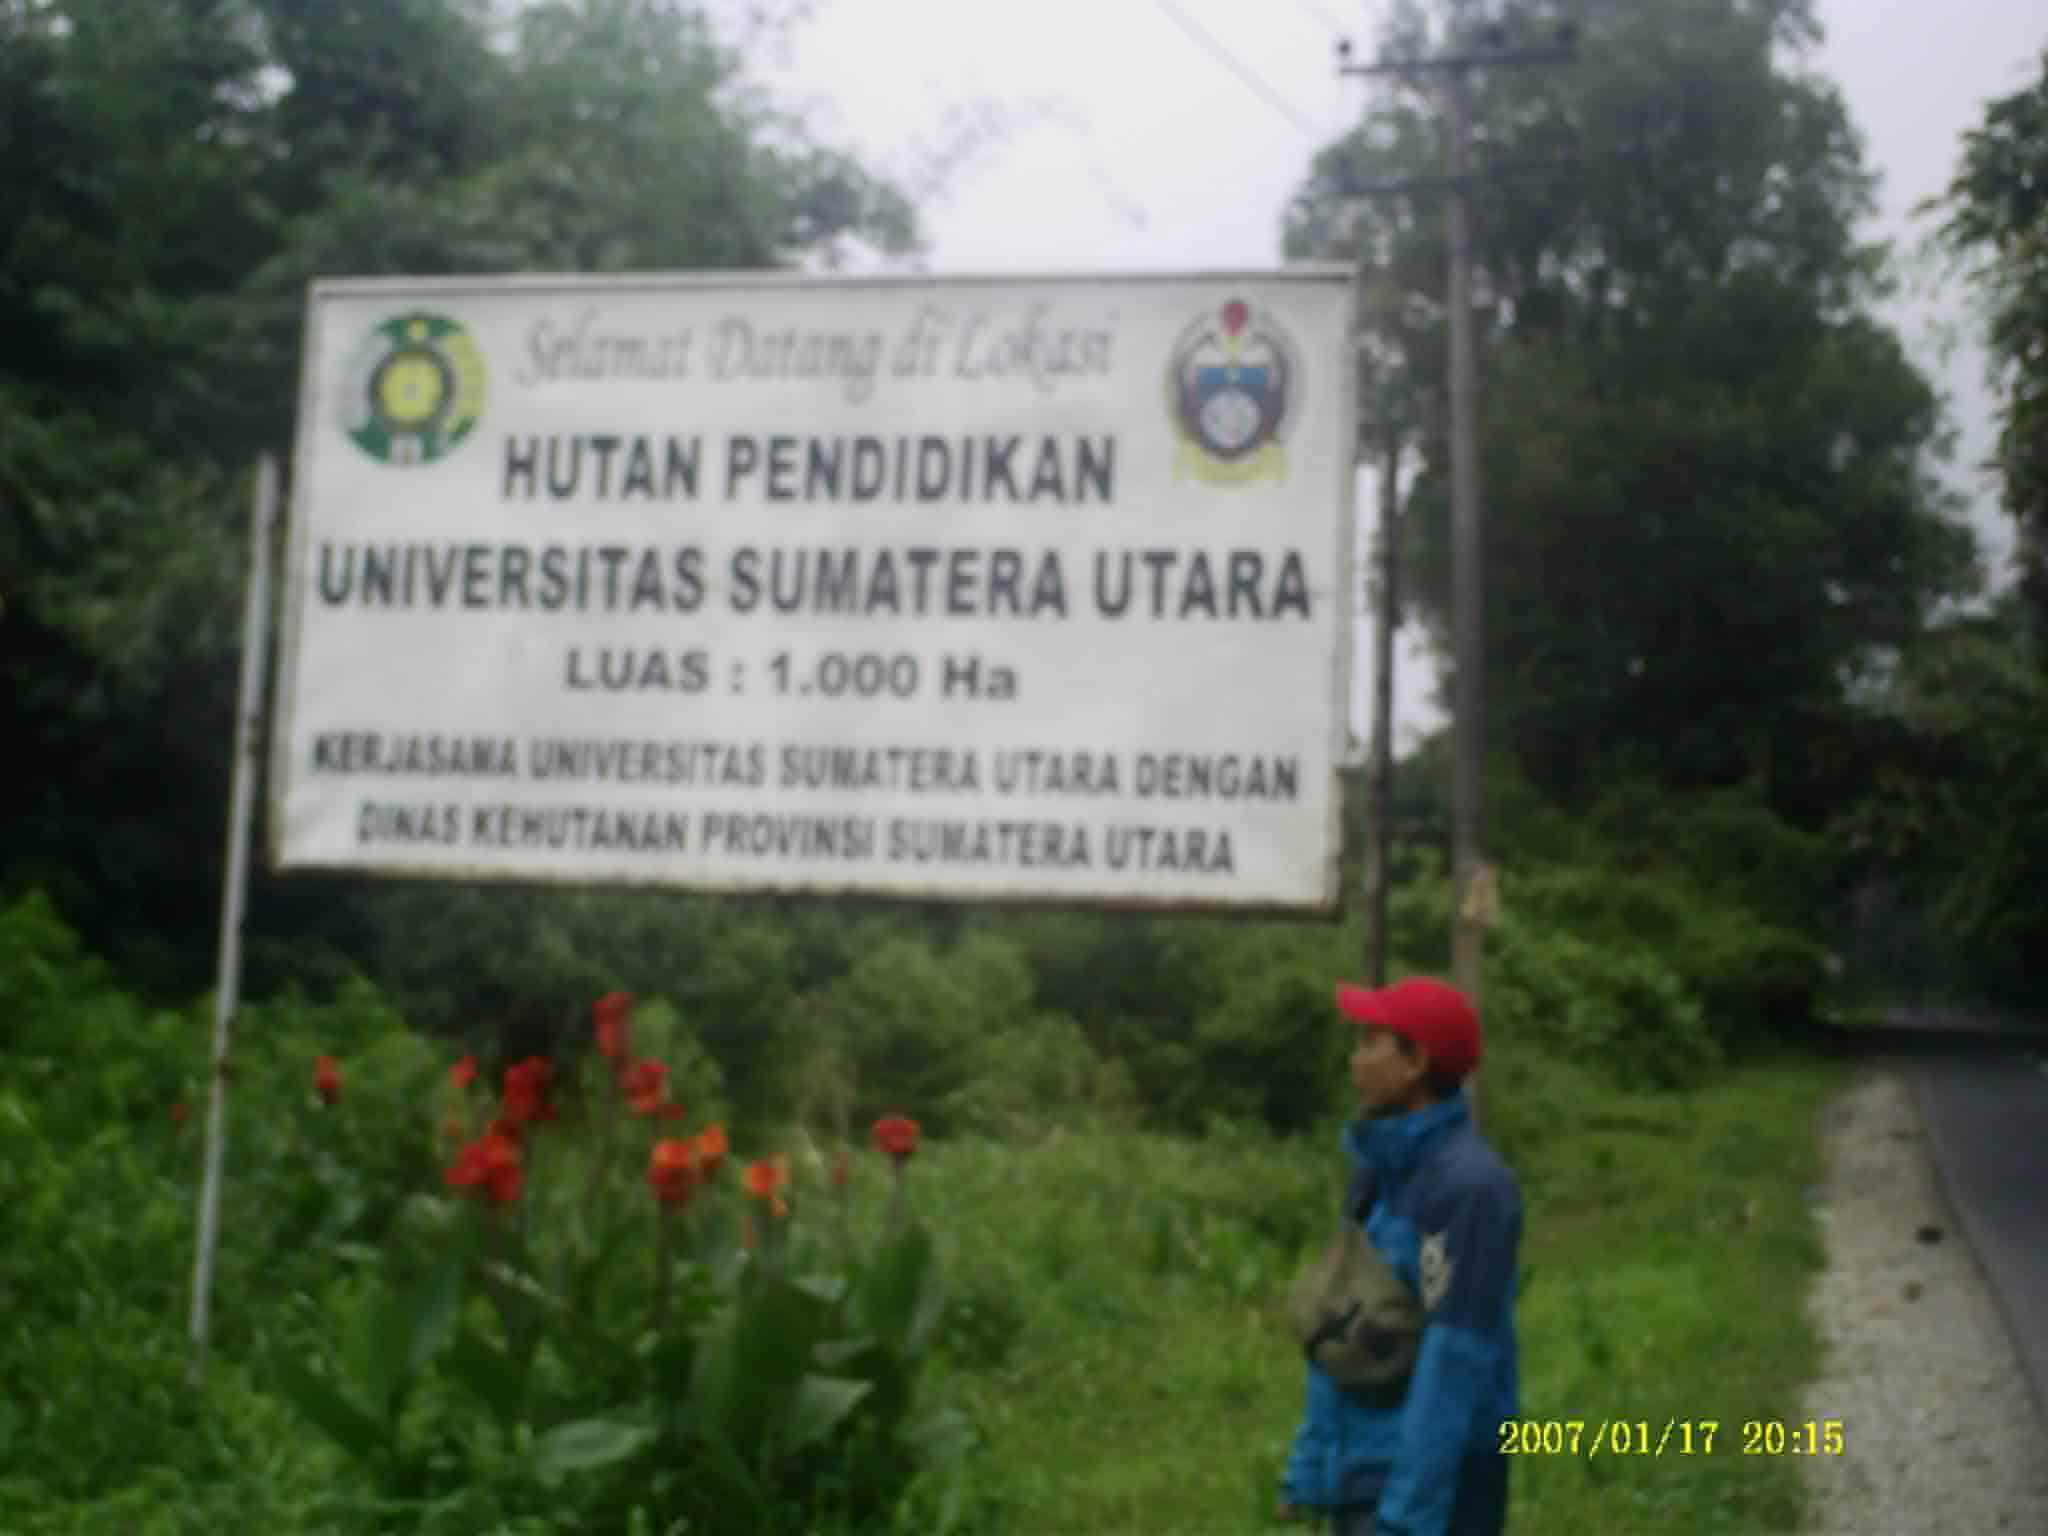 Hutan-untuk-Pendidikan